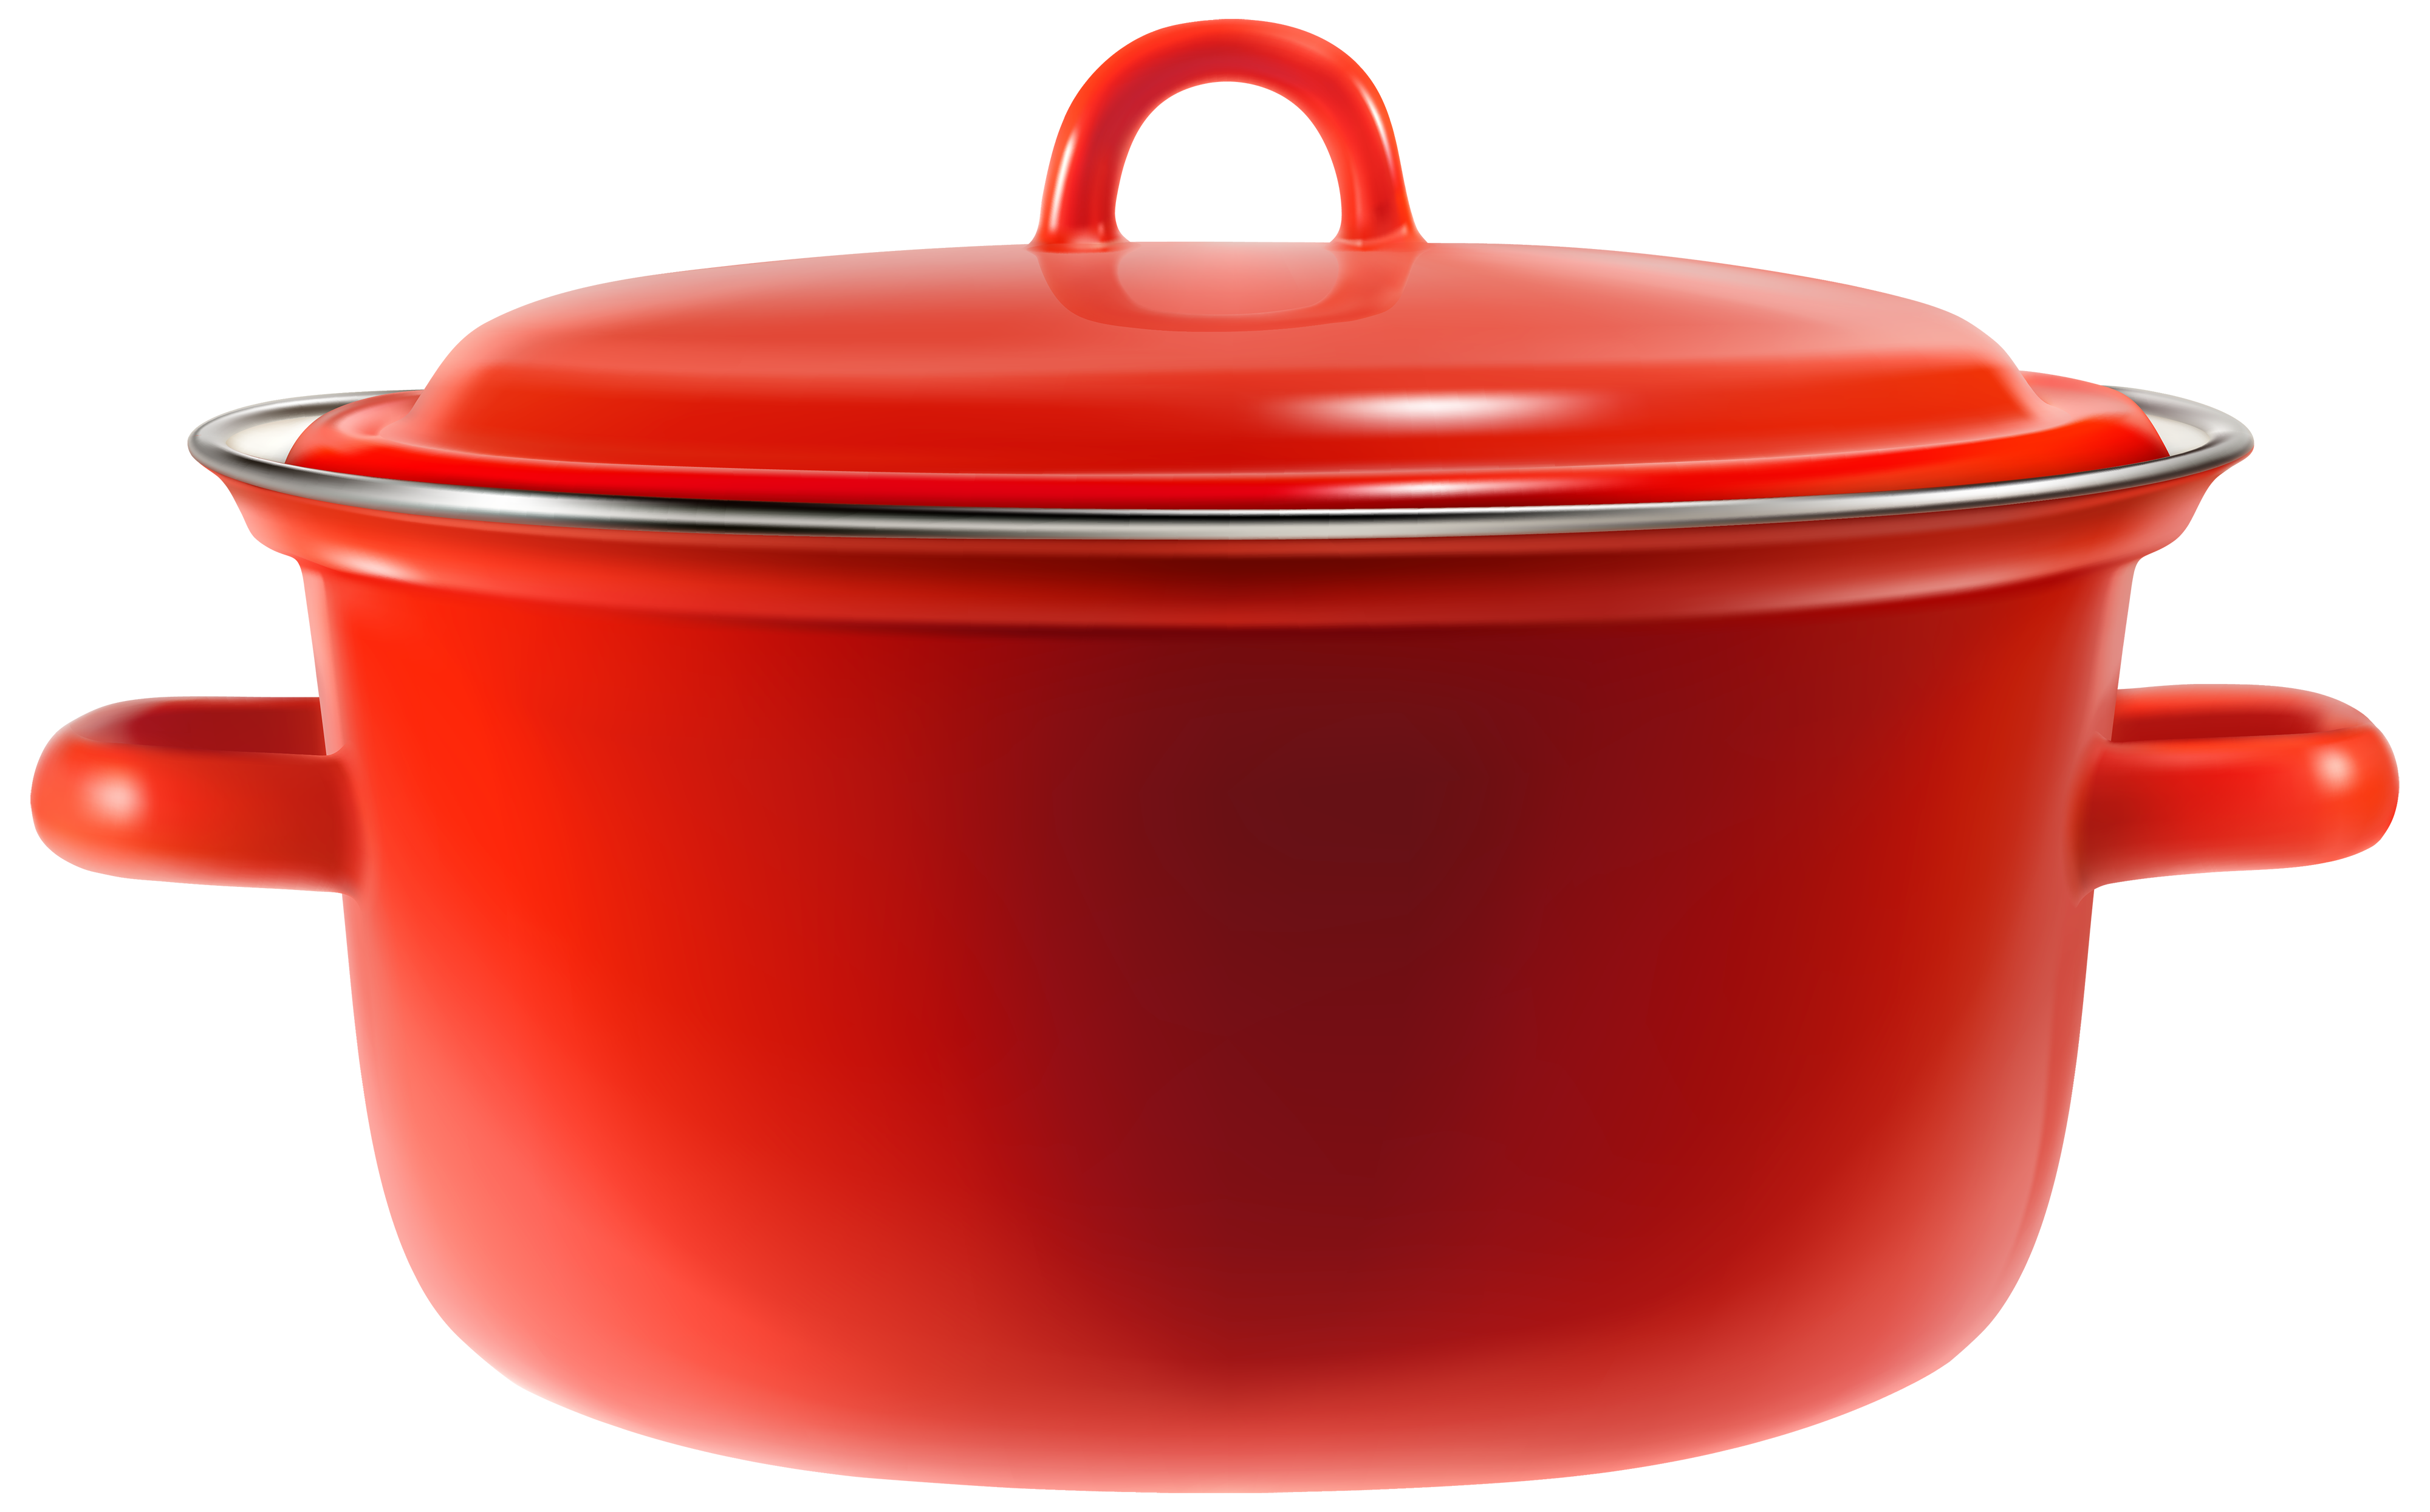 clip art transparent stock Red cooking best web. Pot clipart.